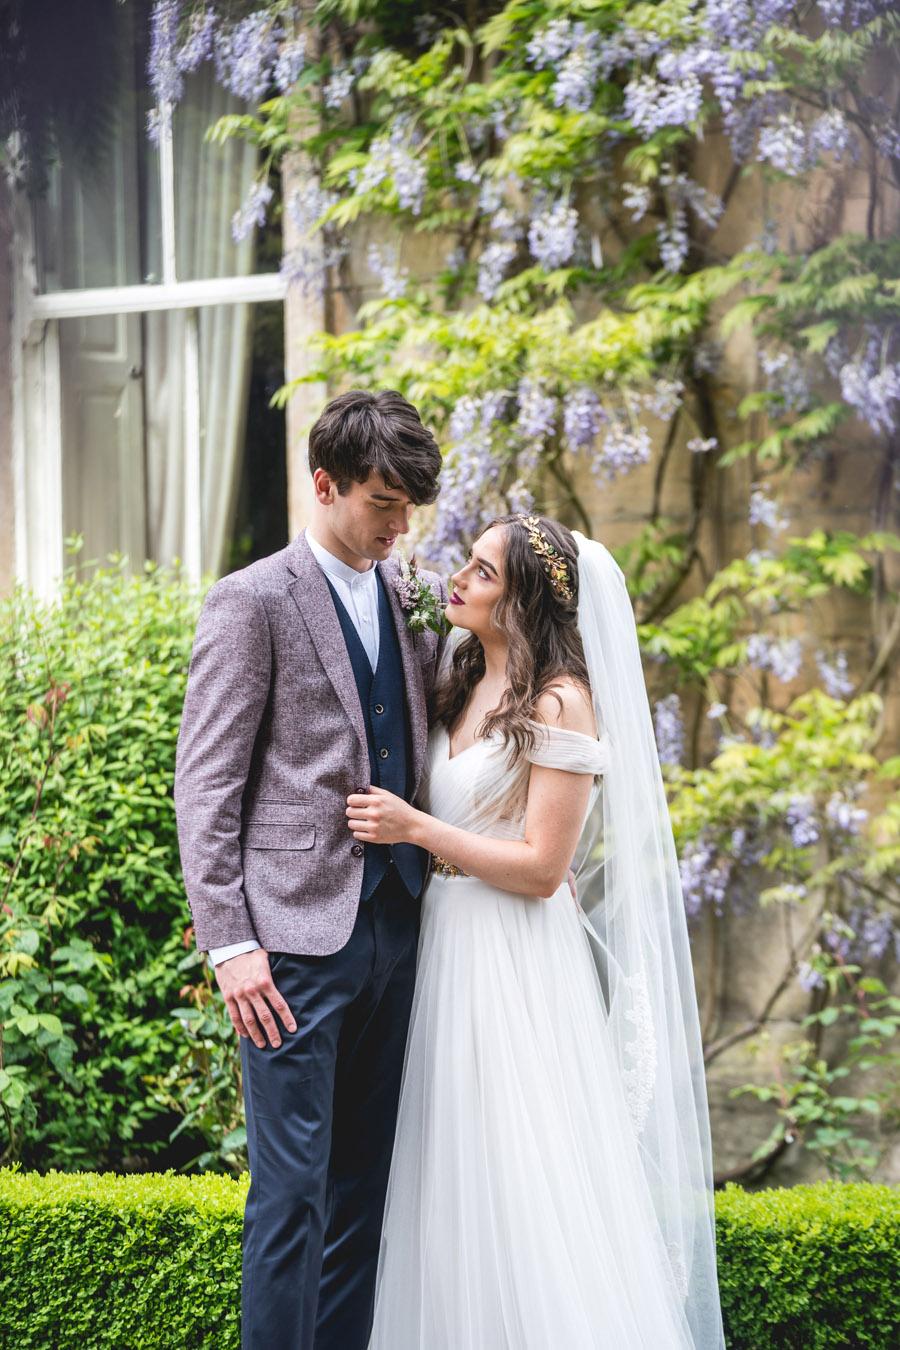 Eshott Hall wedding inspiration, credit Sean Elliott Photography (20)